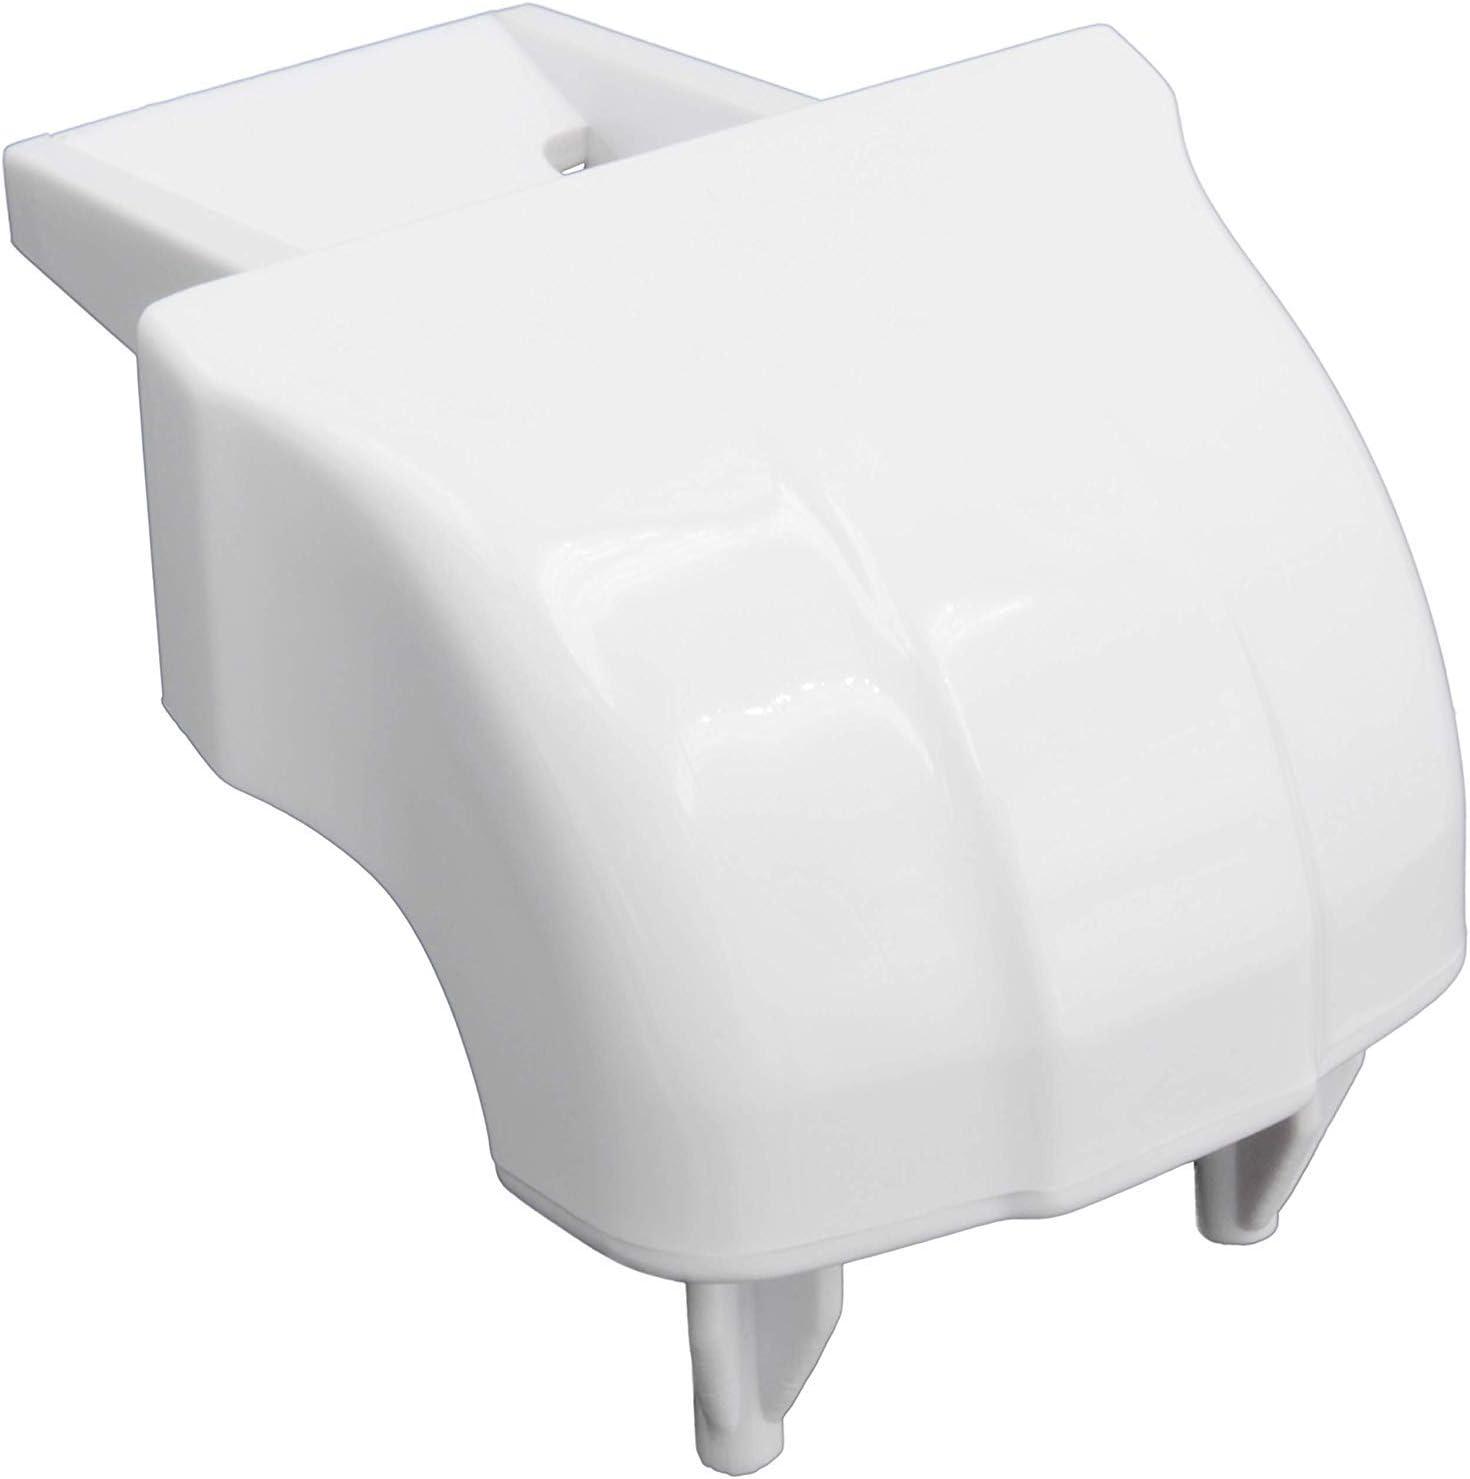 PS299579 Refrigerator Door Shelf End Cap Support for GE Refrigerators